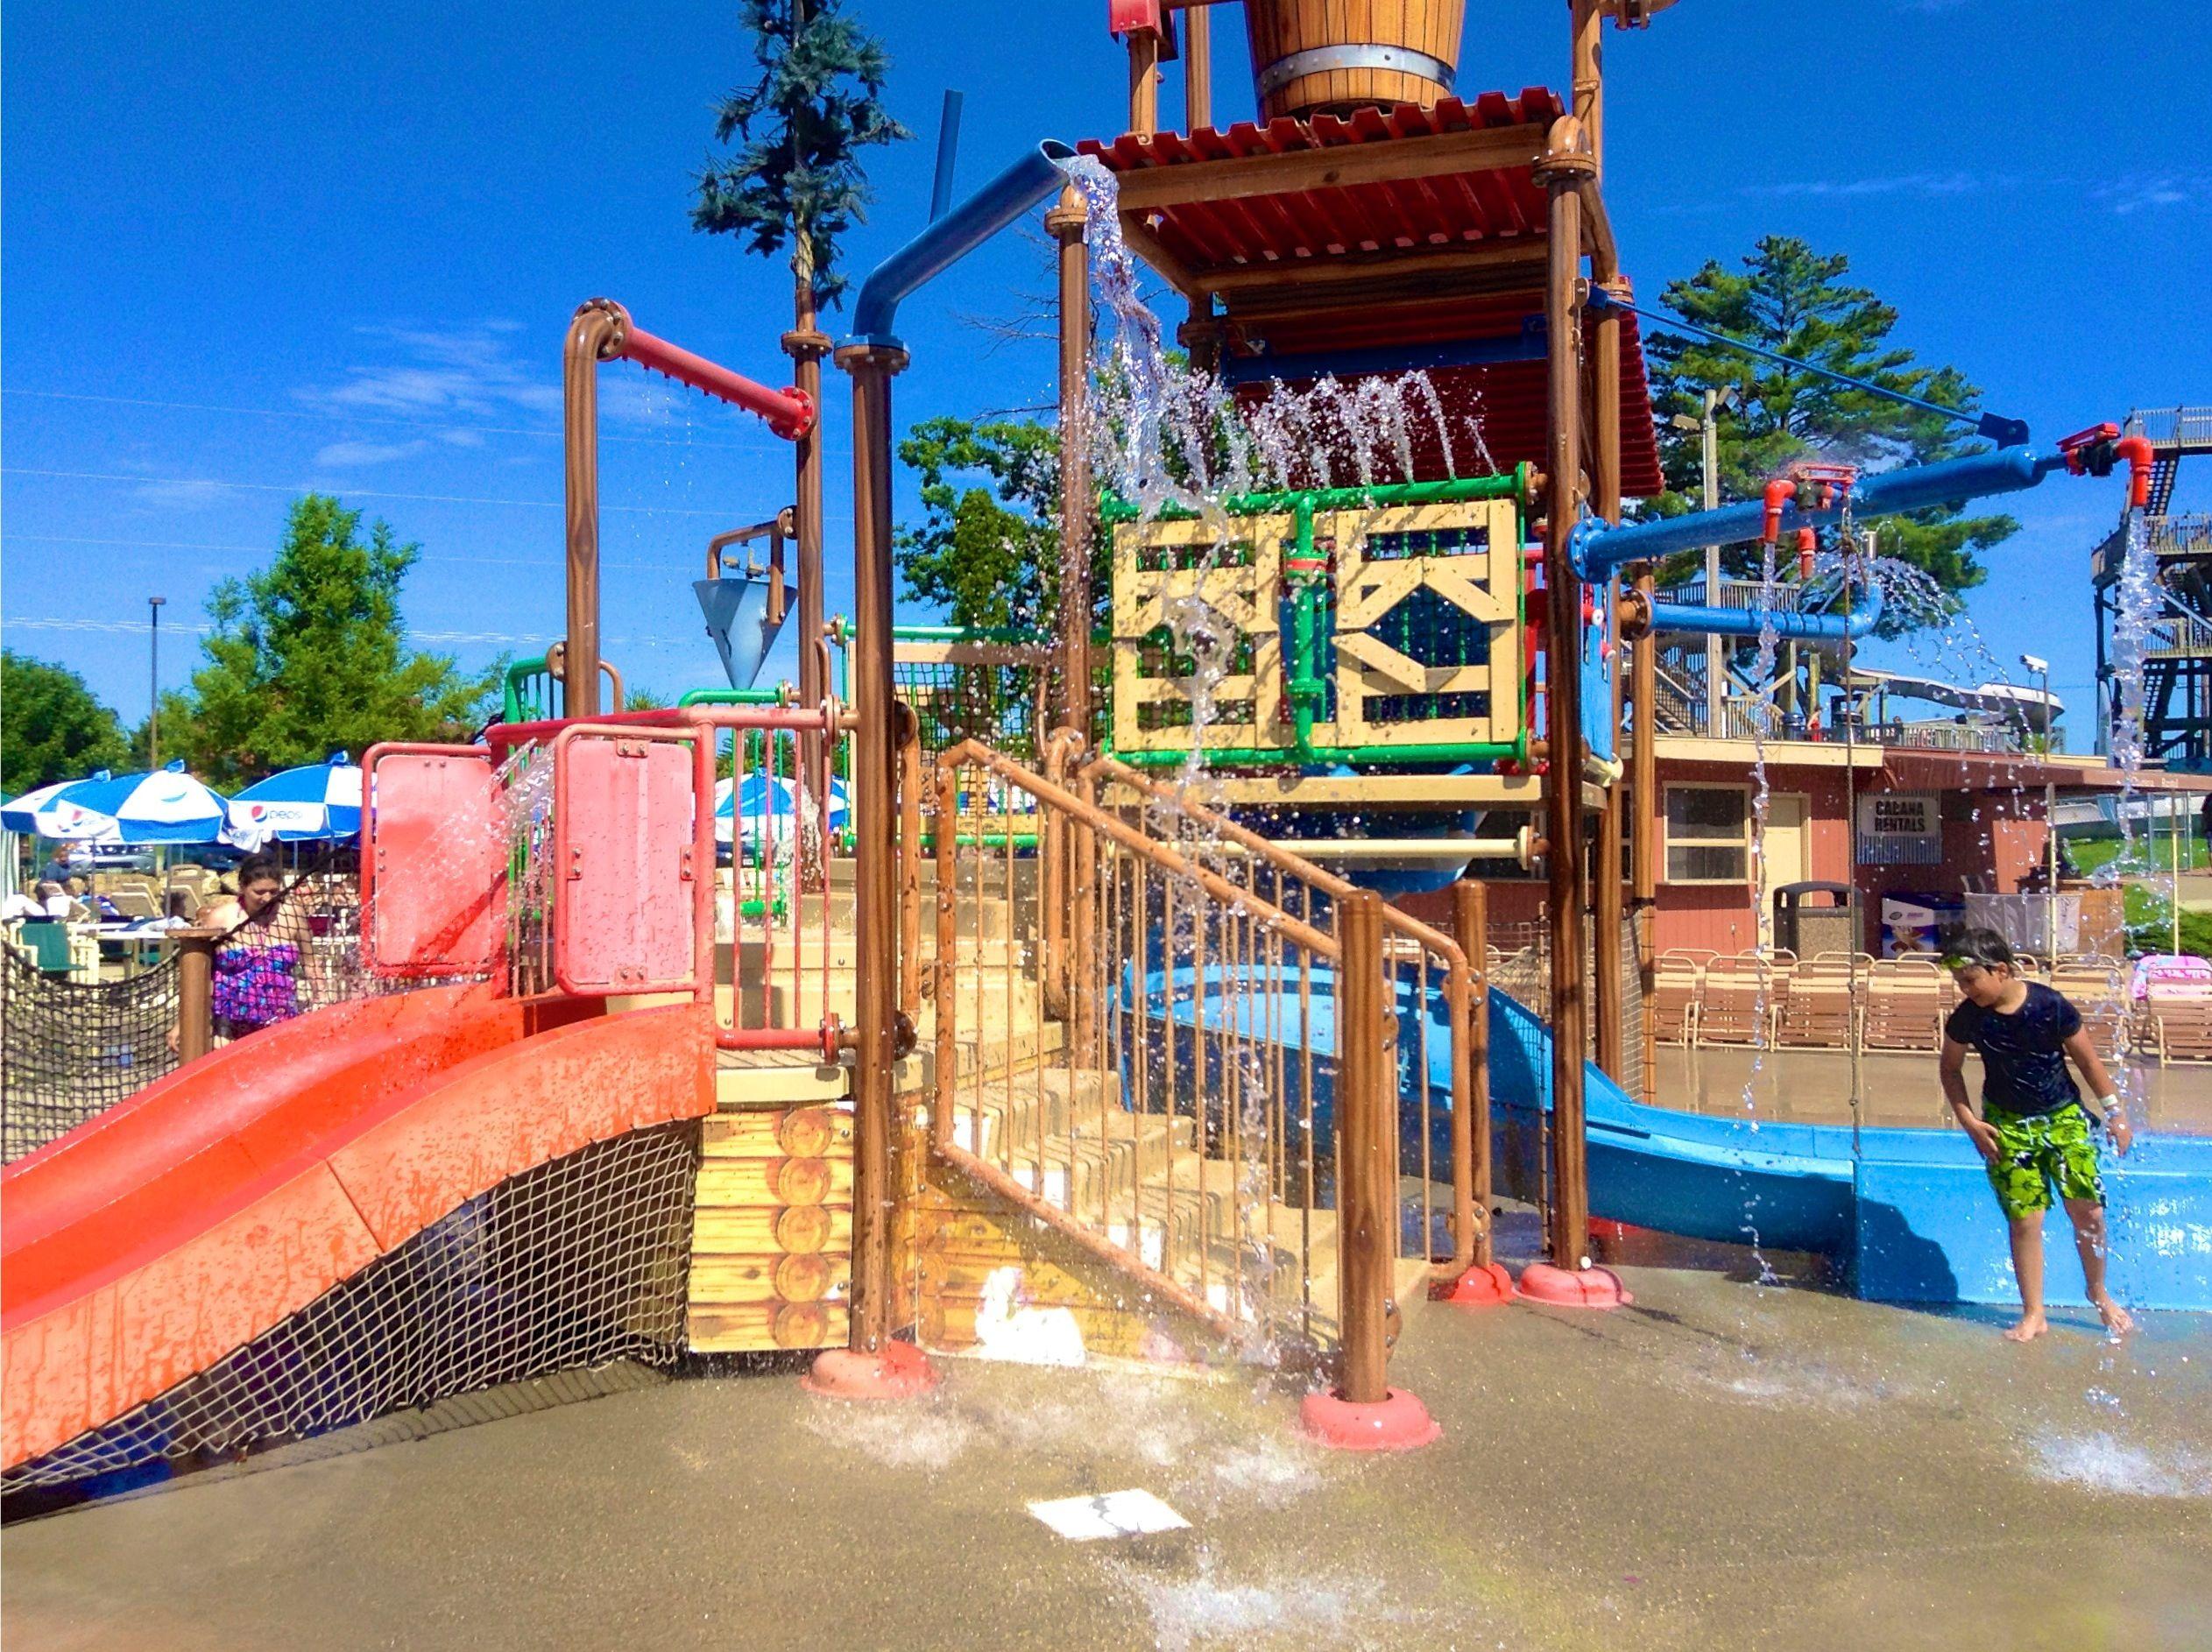 chula vista resort u0027s outdoor water park kid u0027s play area is a